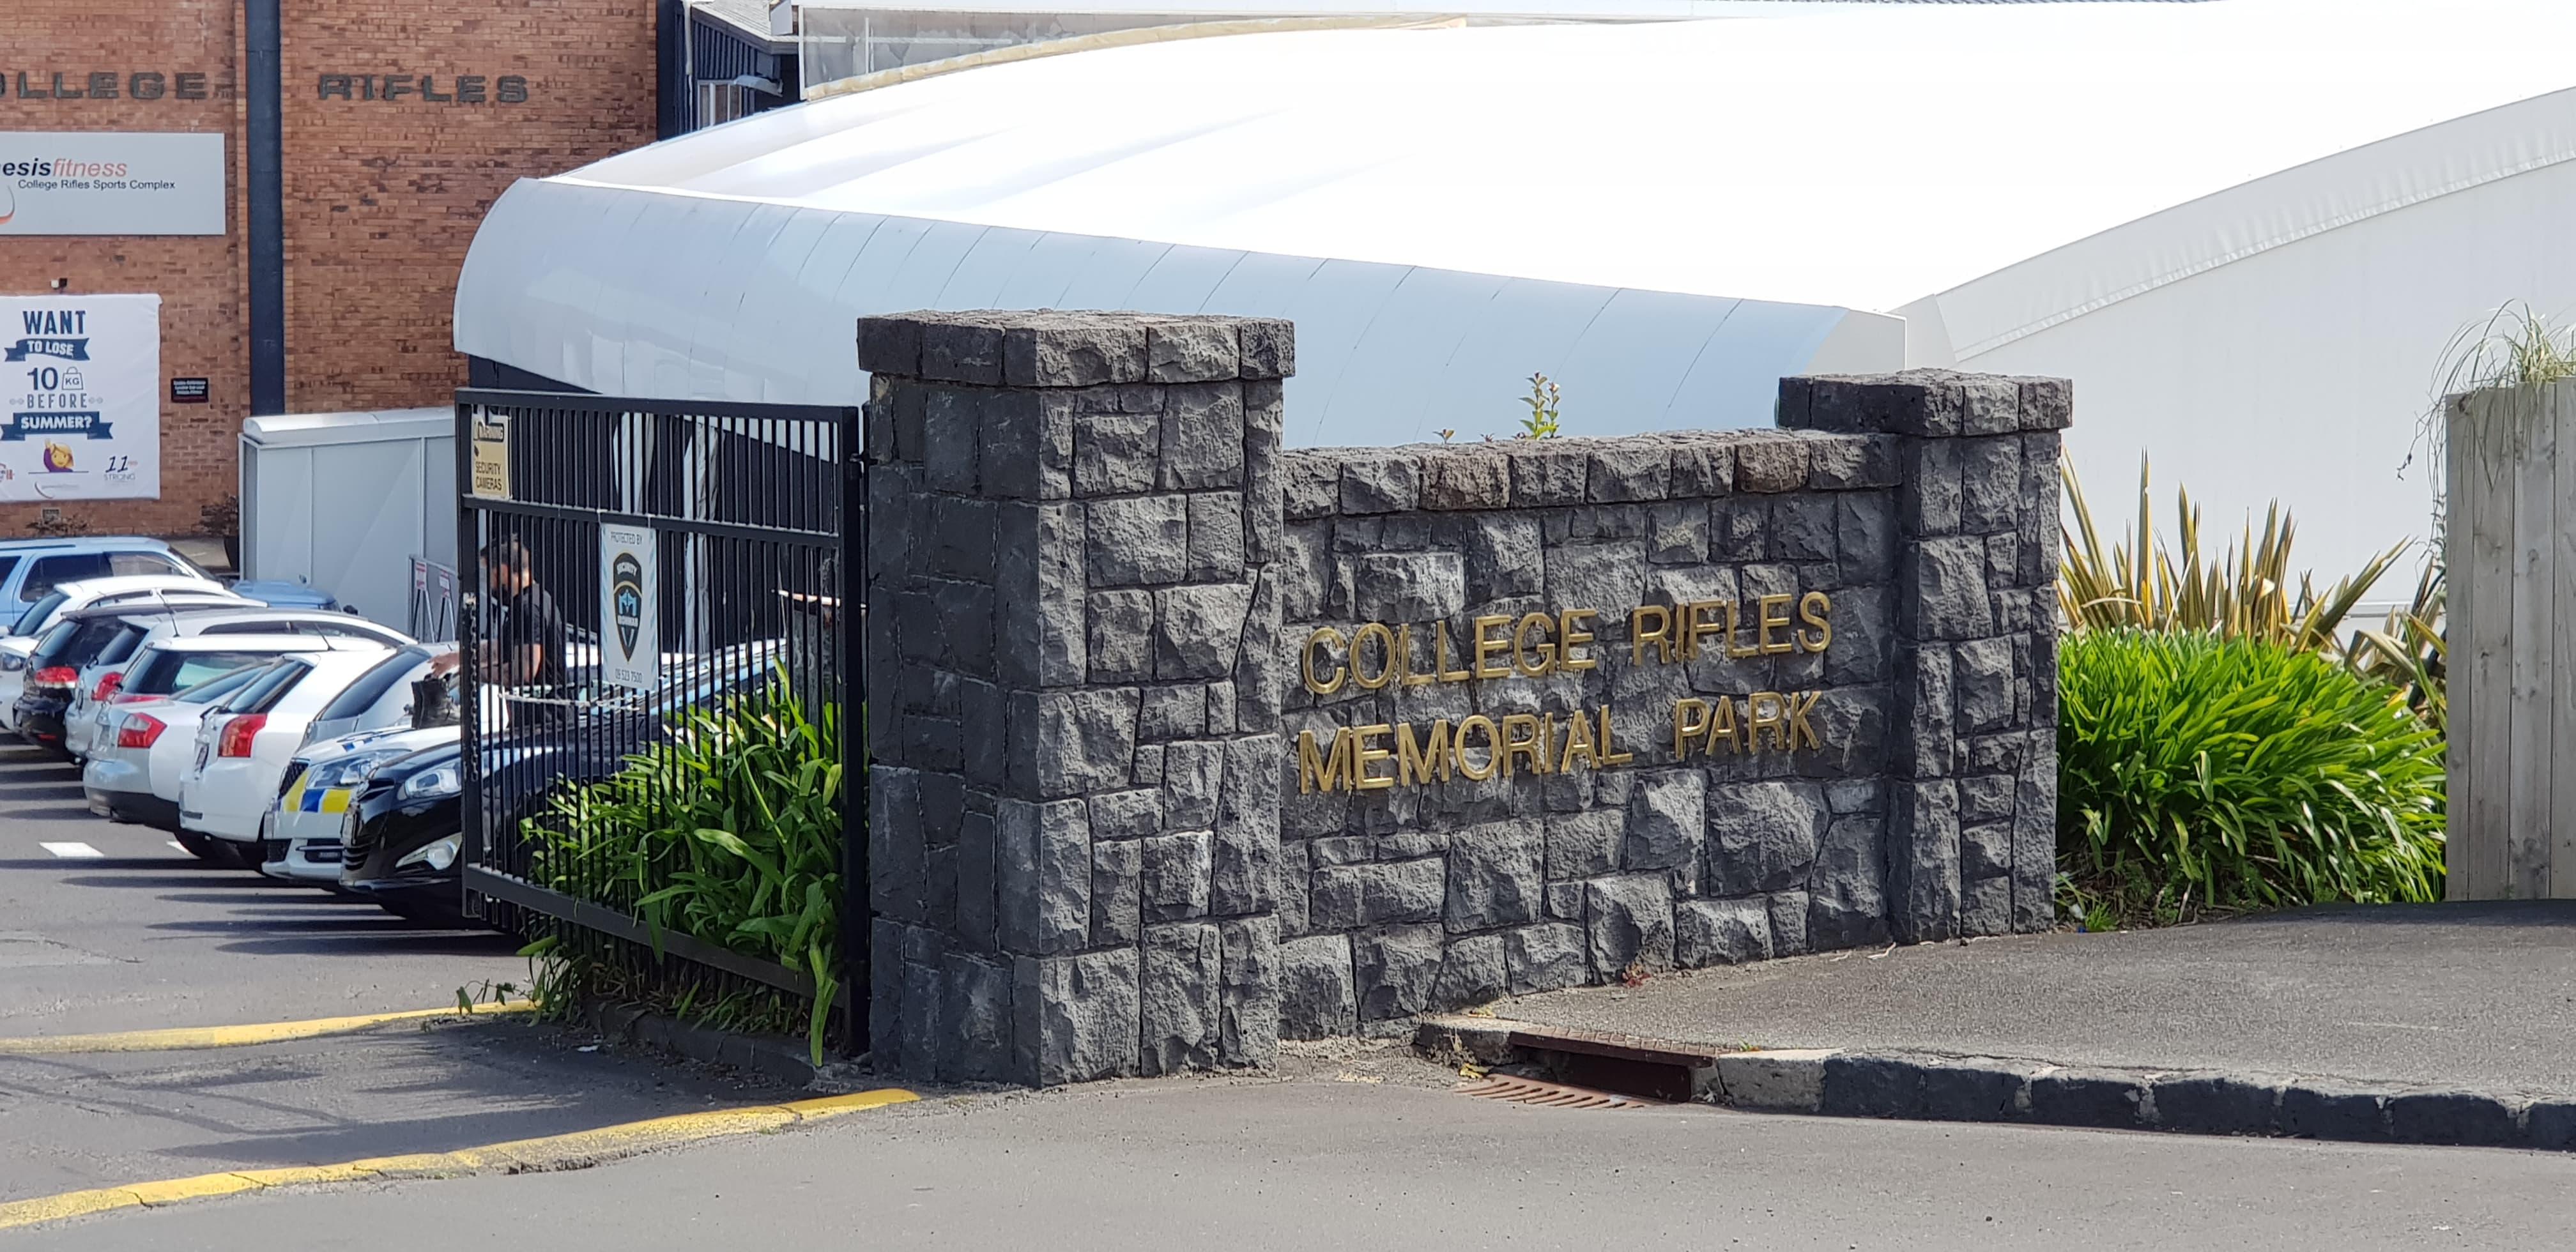 Grand Entrance Way